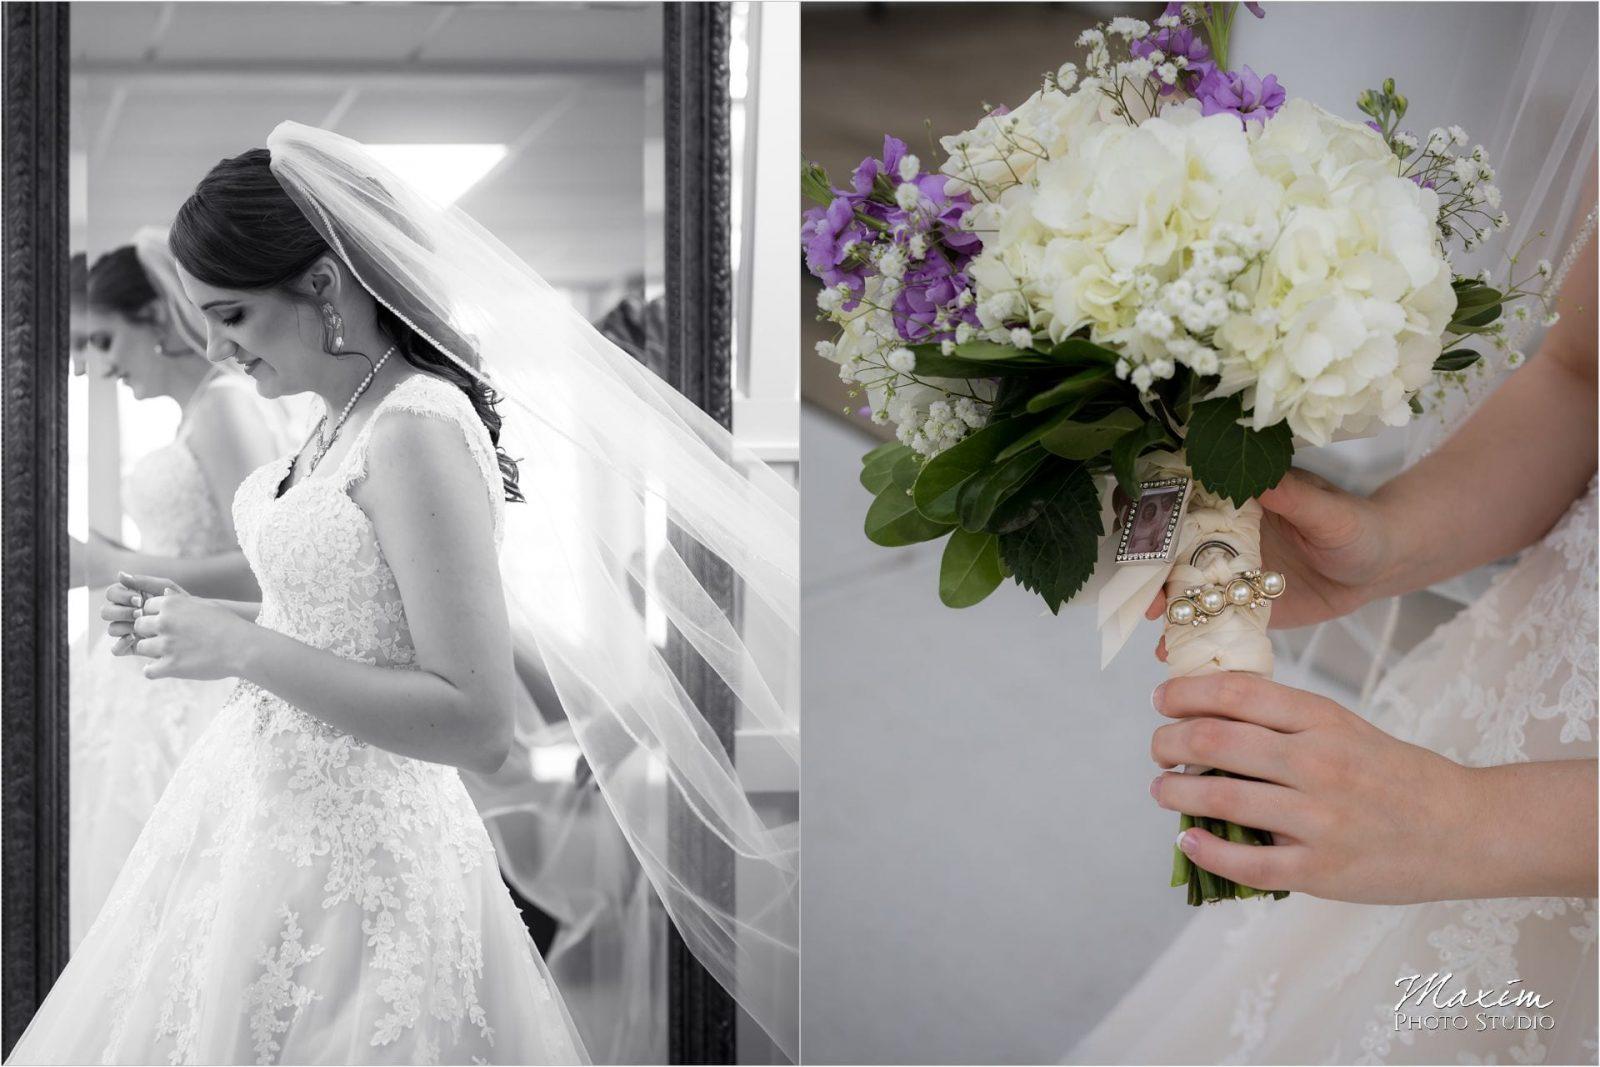 Anderson Hills UMC, Cincinnati Wedding Photography, Bride preparations, Fabulous Bridal Wedding Dress